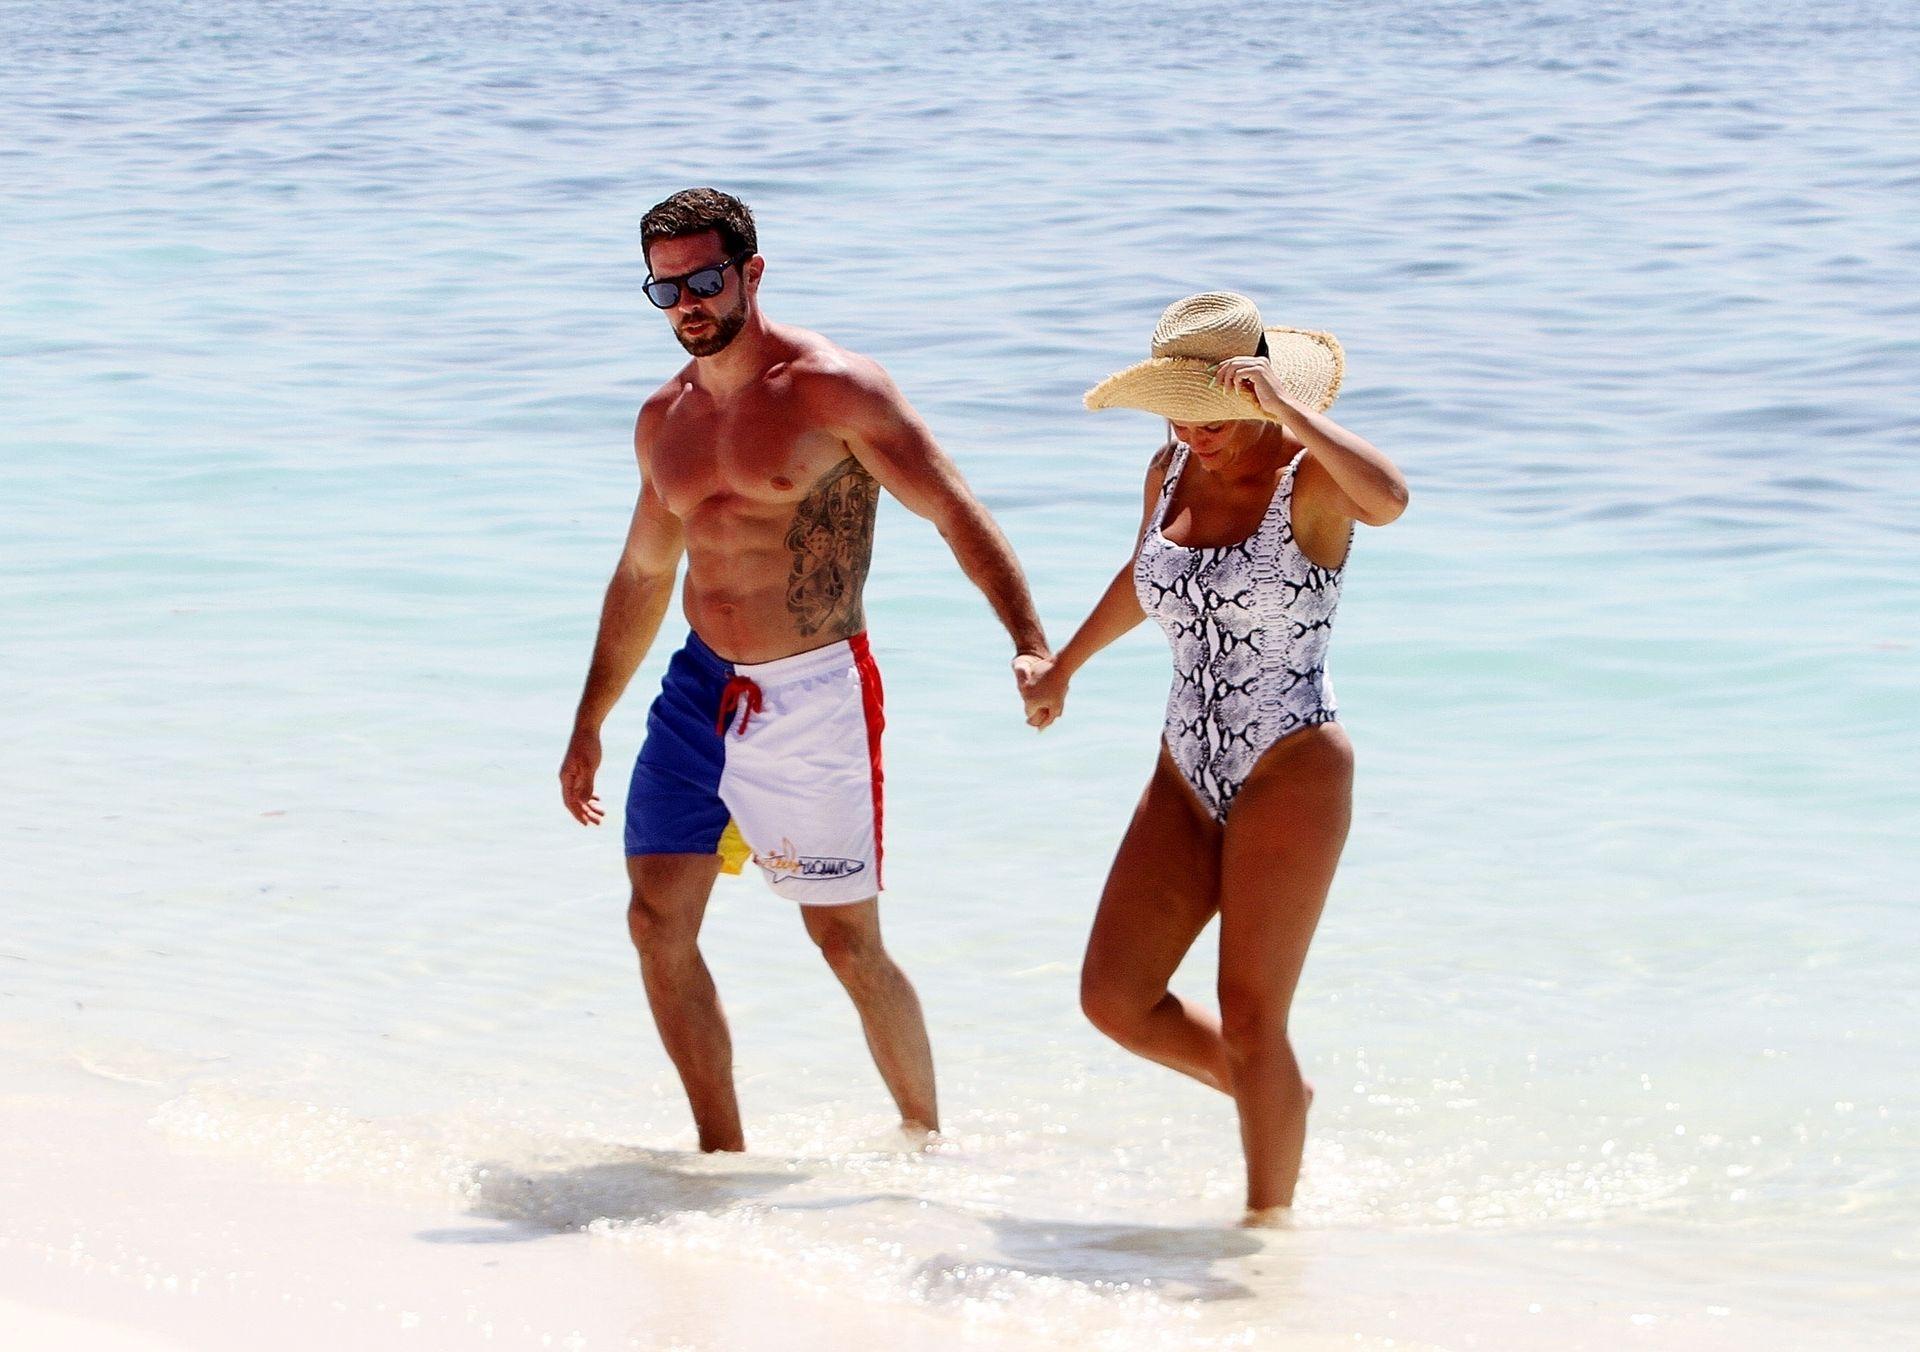 Kerry Katona & Ryan Mahoney Hit The Beach On Holiday At Their Luxury 5 Star Resort Ayada Maldives 0013